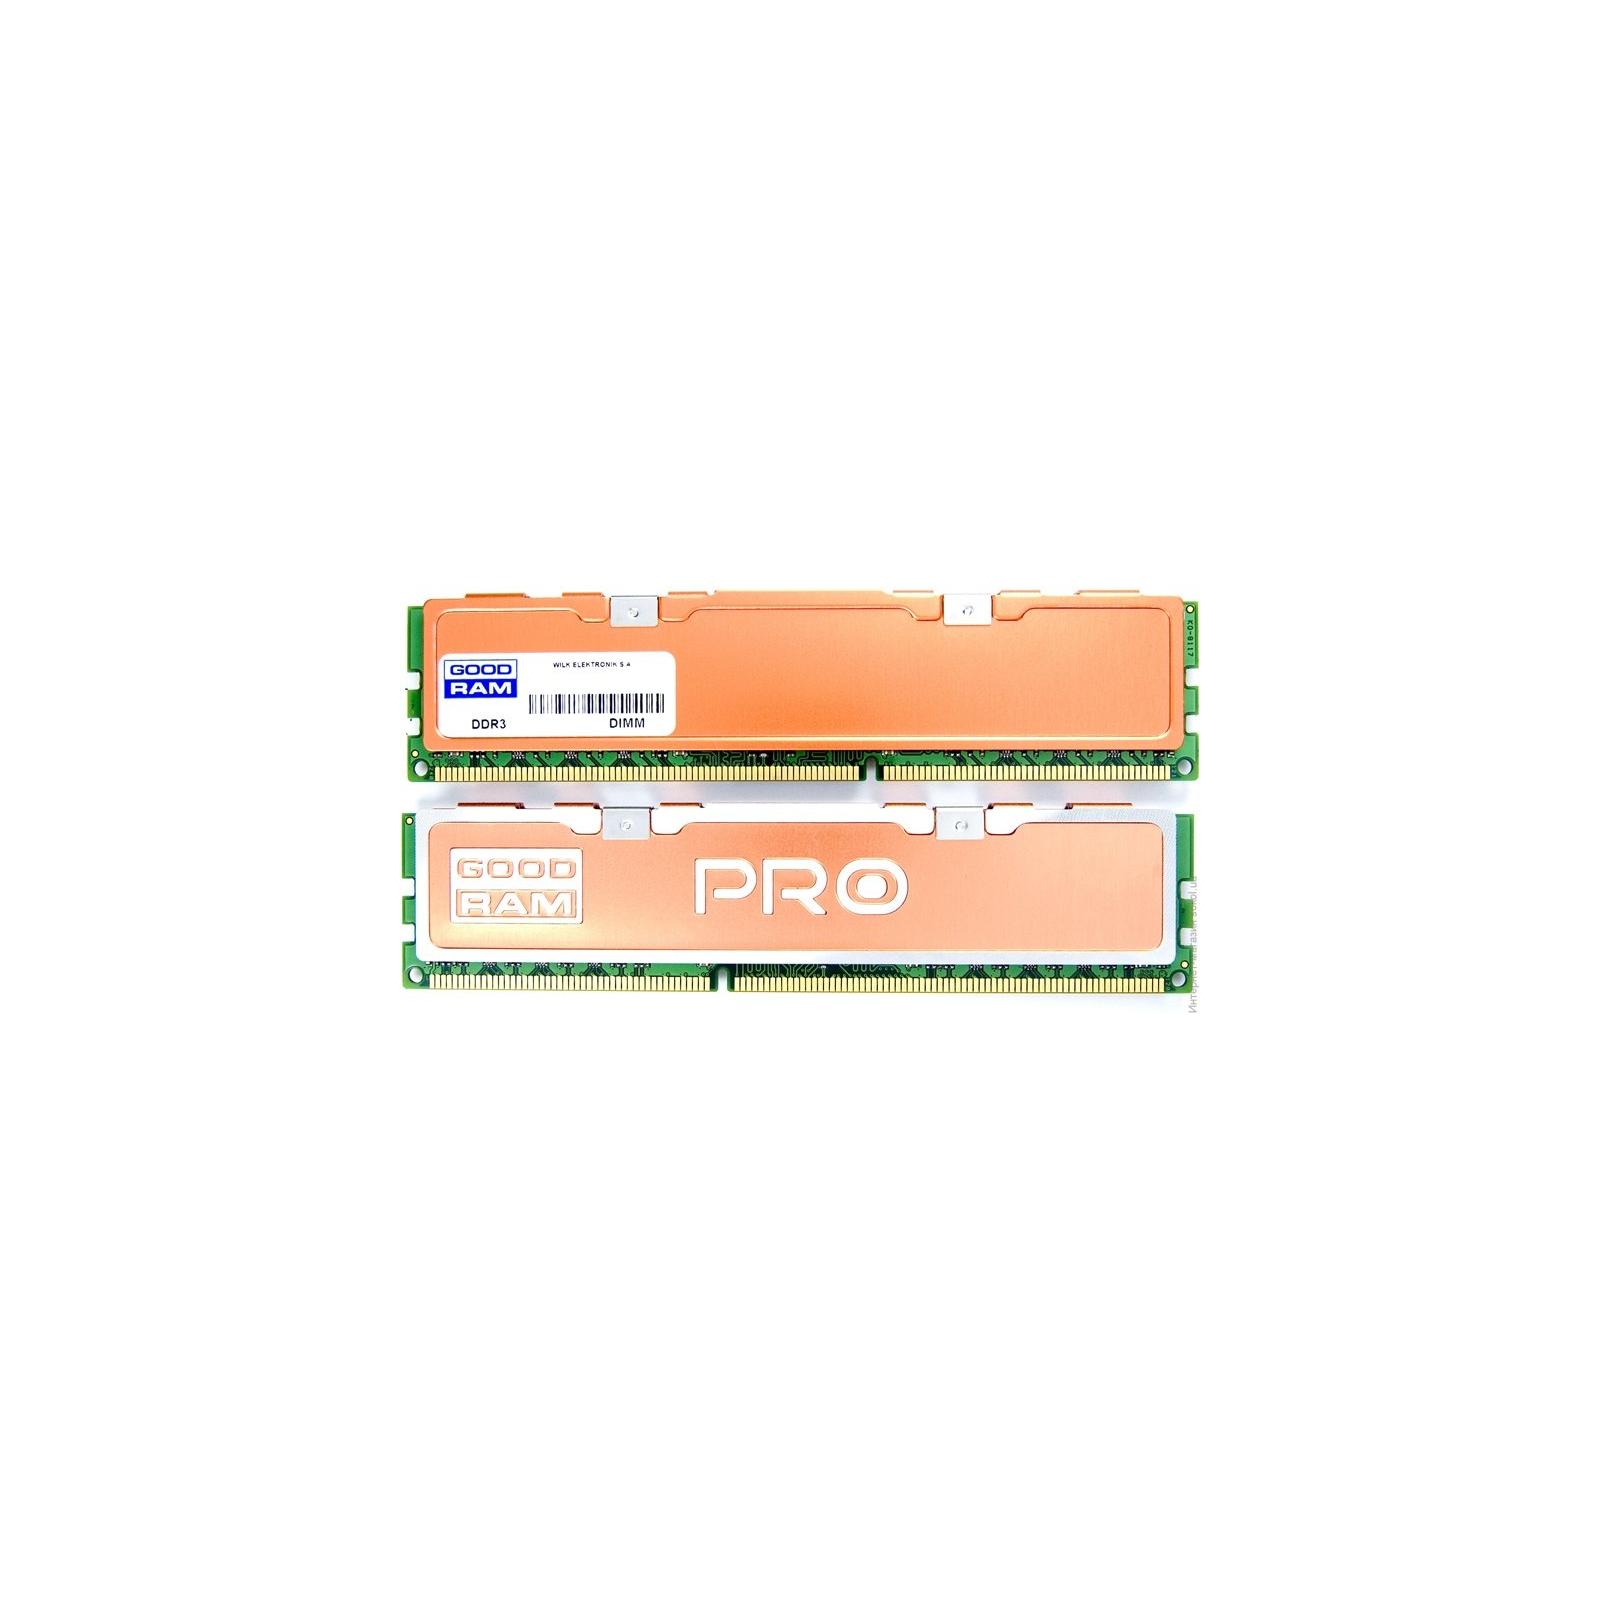 Модуль памяти для компьютера DDR3 8Gb (2x4GB) 2400 MHz PRO GOODRAM (GP2400D364L11S/8GDC)